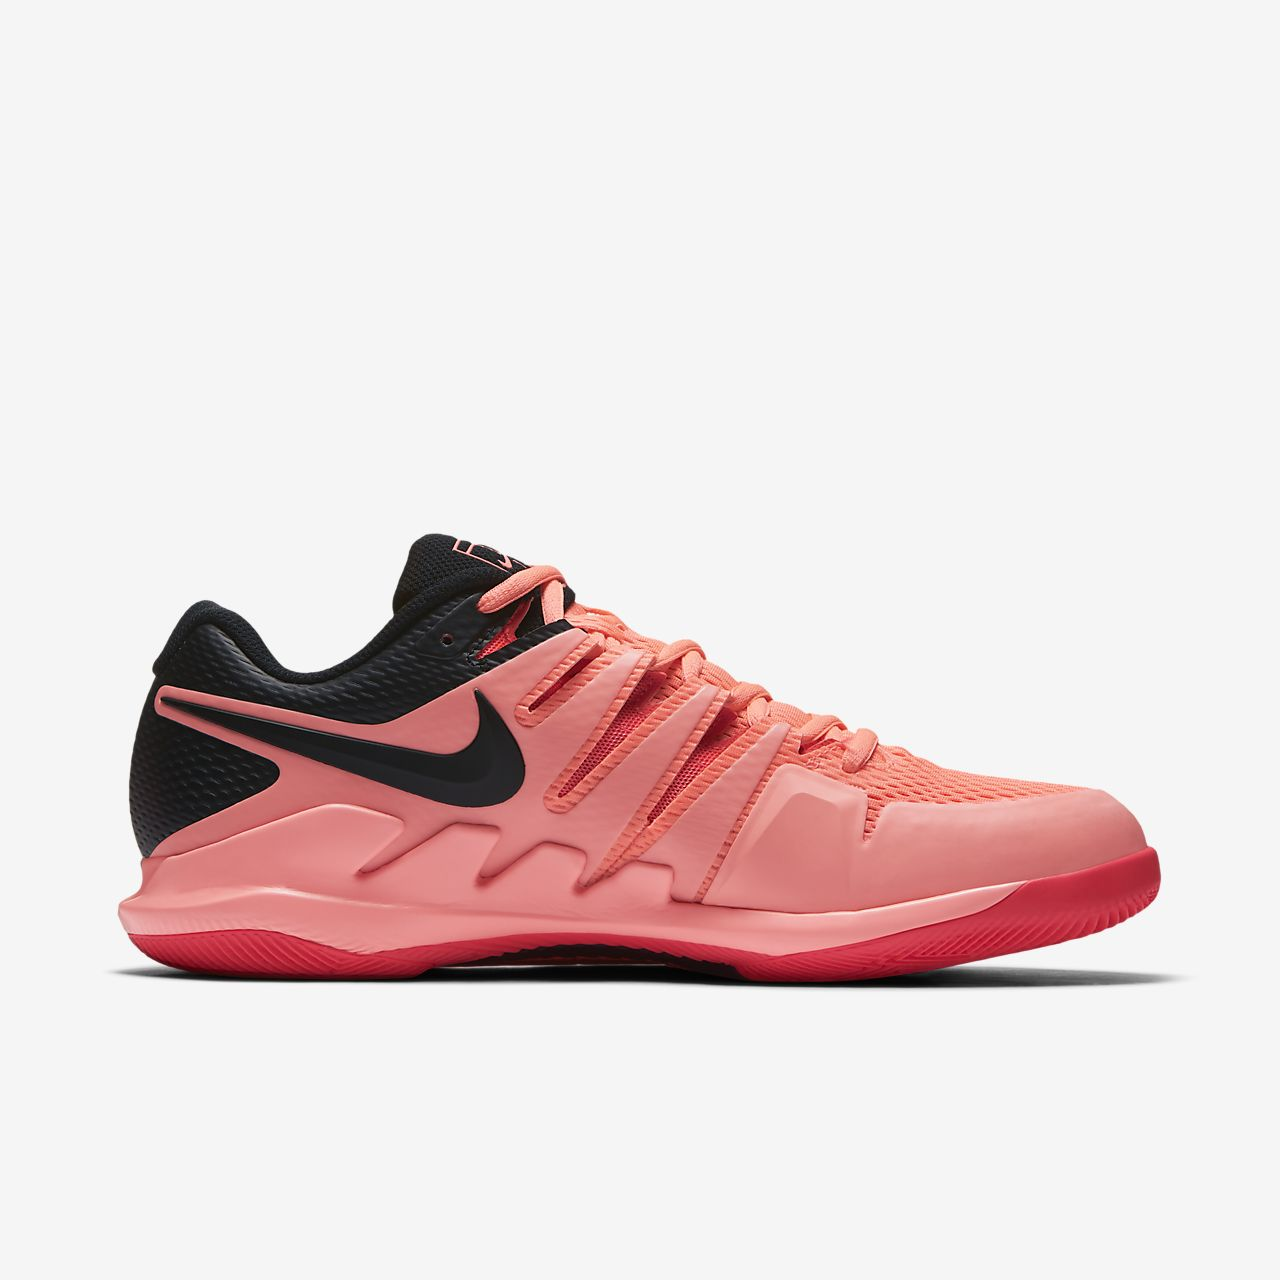 ... NikeCourt Air Zoom Vapor X Men's Tennis Shoe